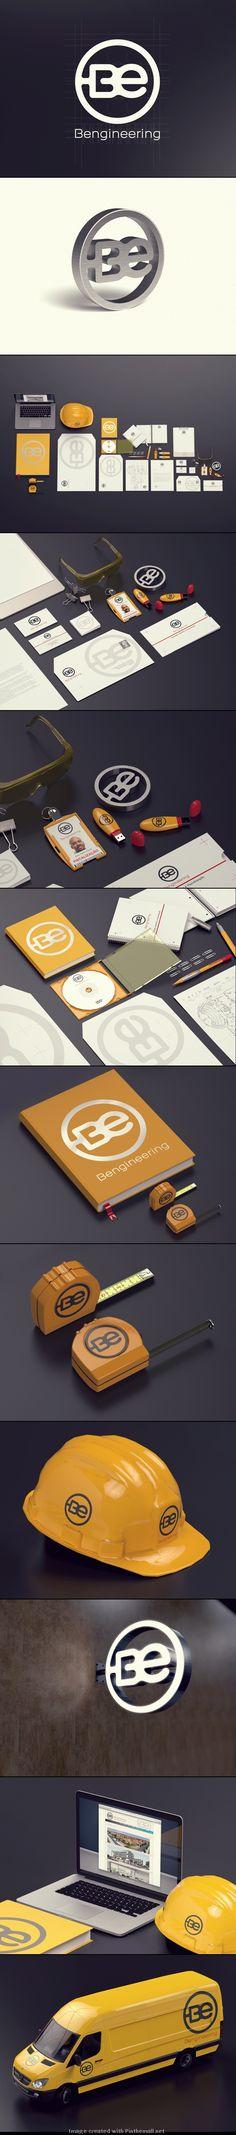 BE Bengineering #logo